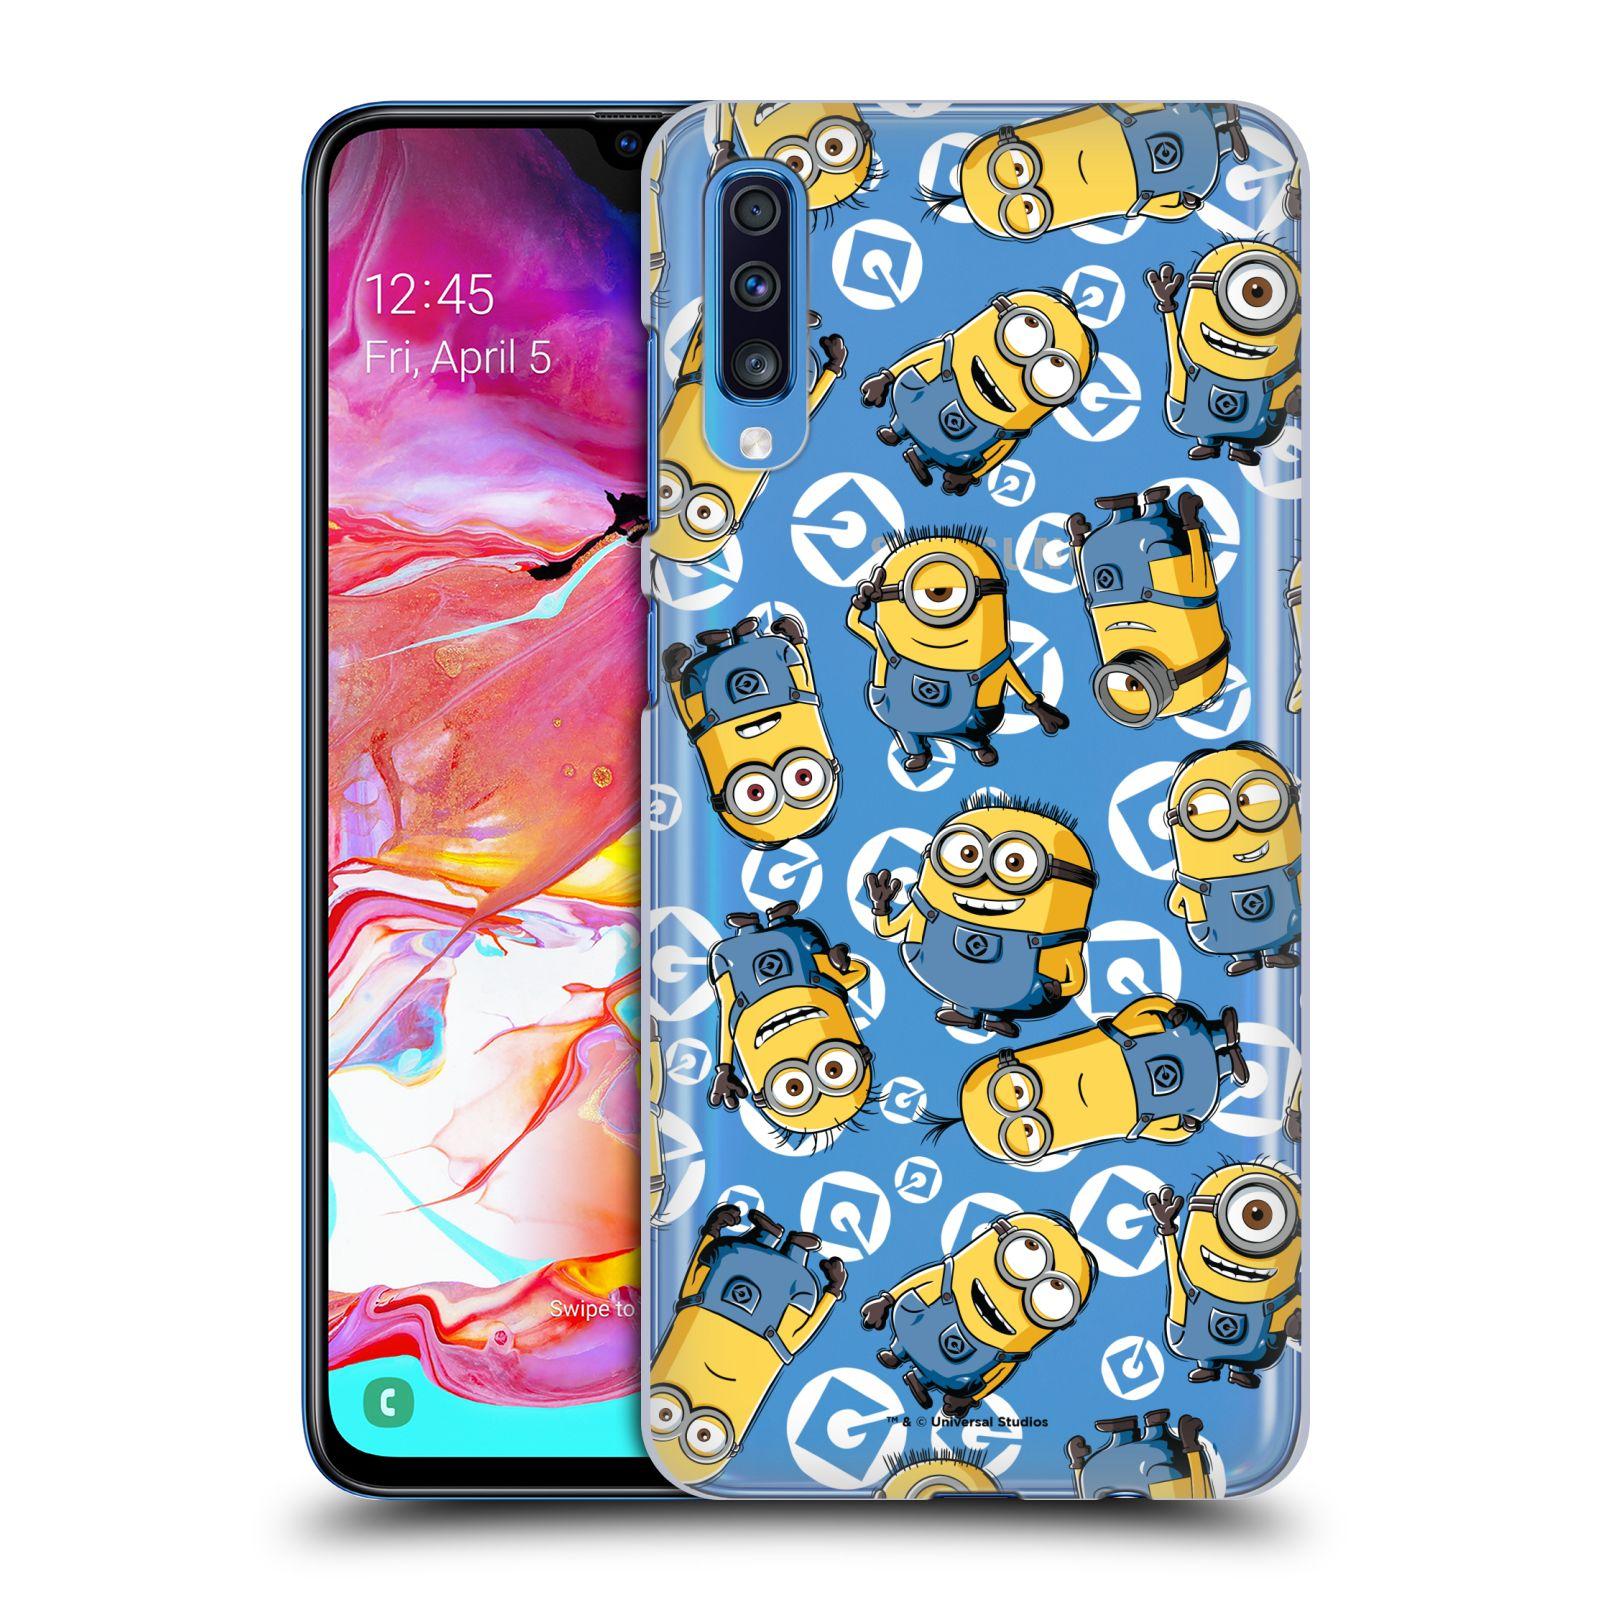 Plastové pouzdro na mobil Samsung Galaxy A70 - Head Case - Minion pattern z filmu Já, padouch - Despicable Me